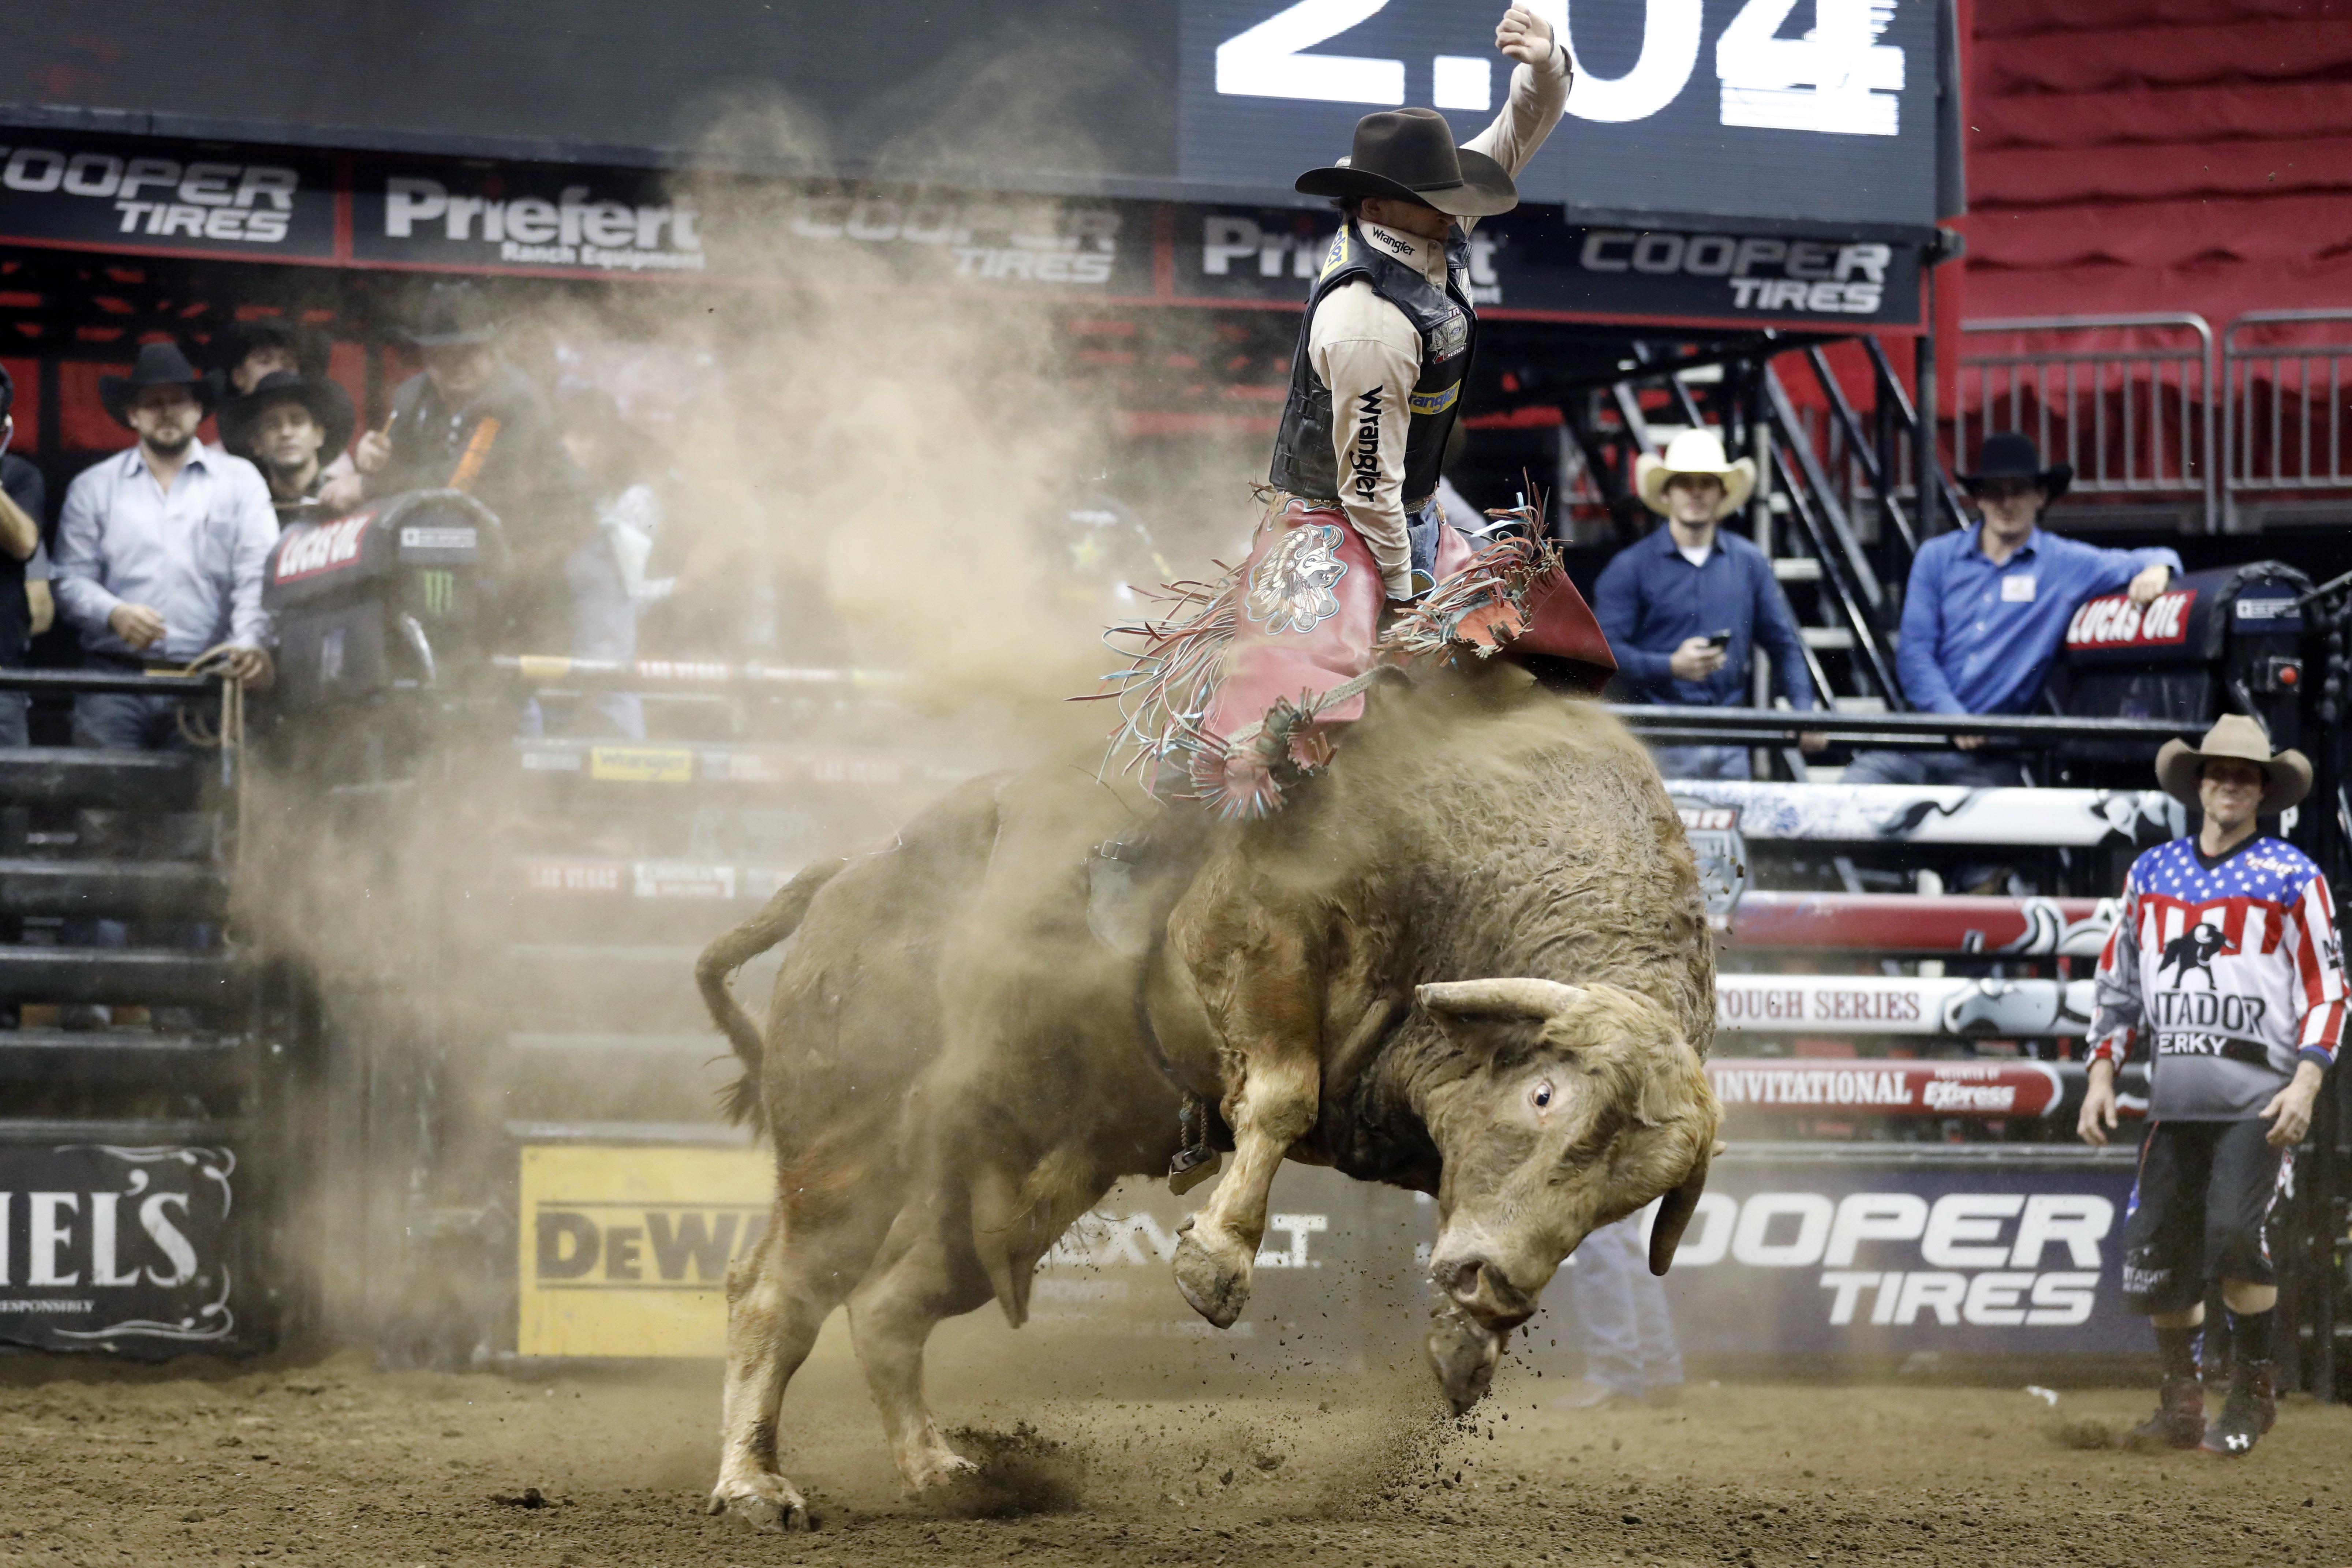 Photo: Mason Lowe Riding Bull Western Stock Show